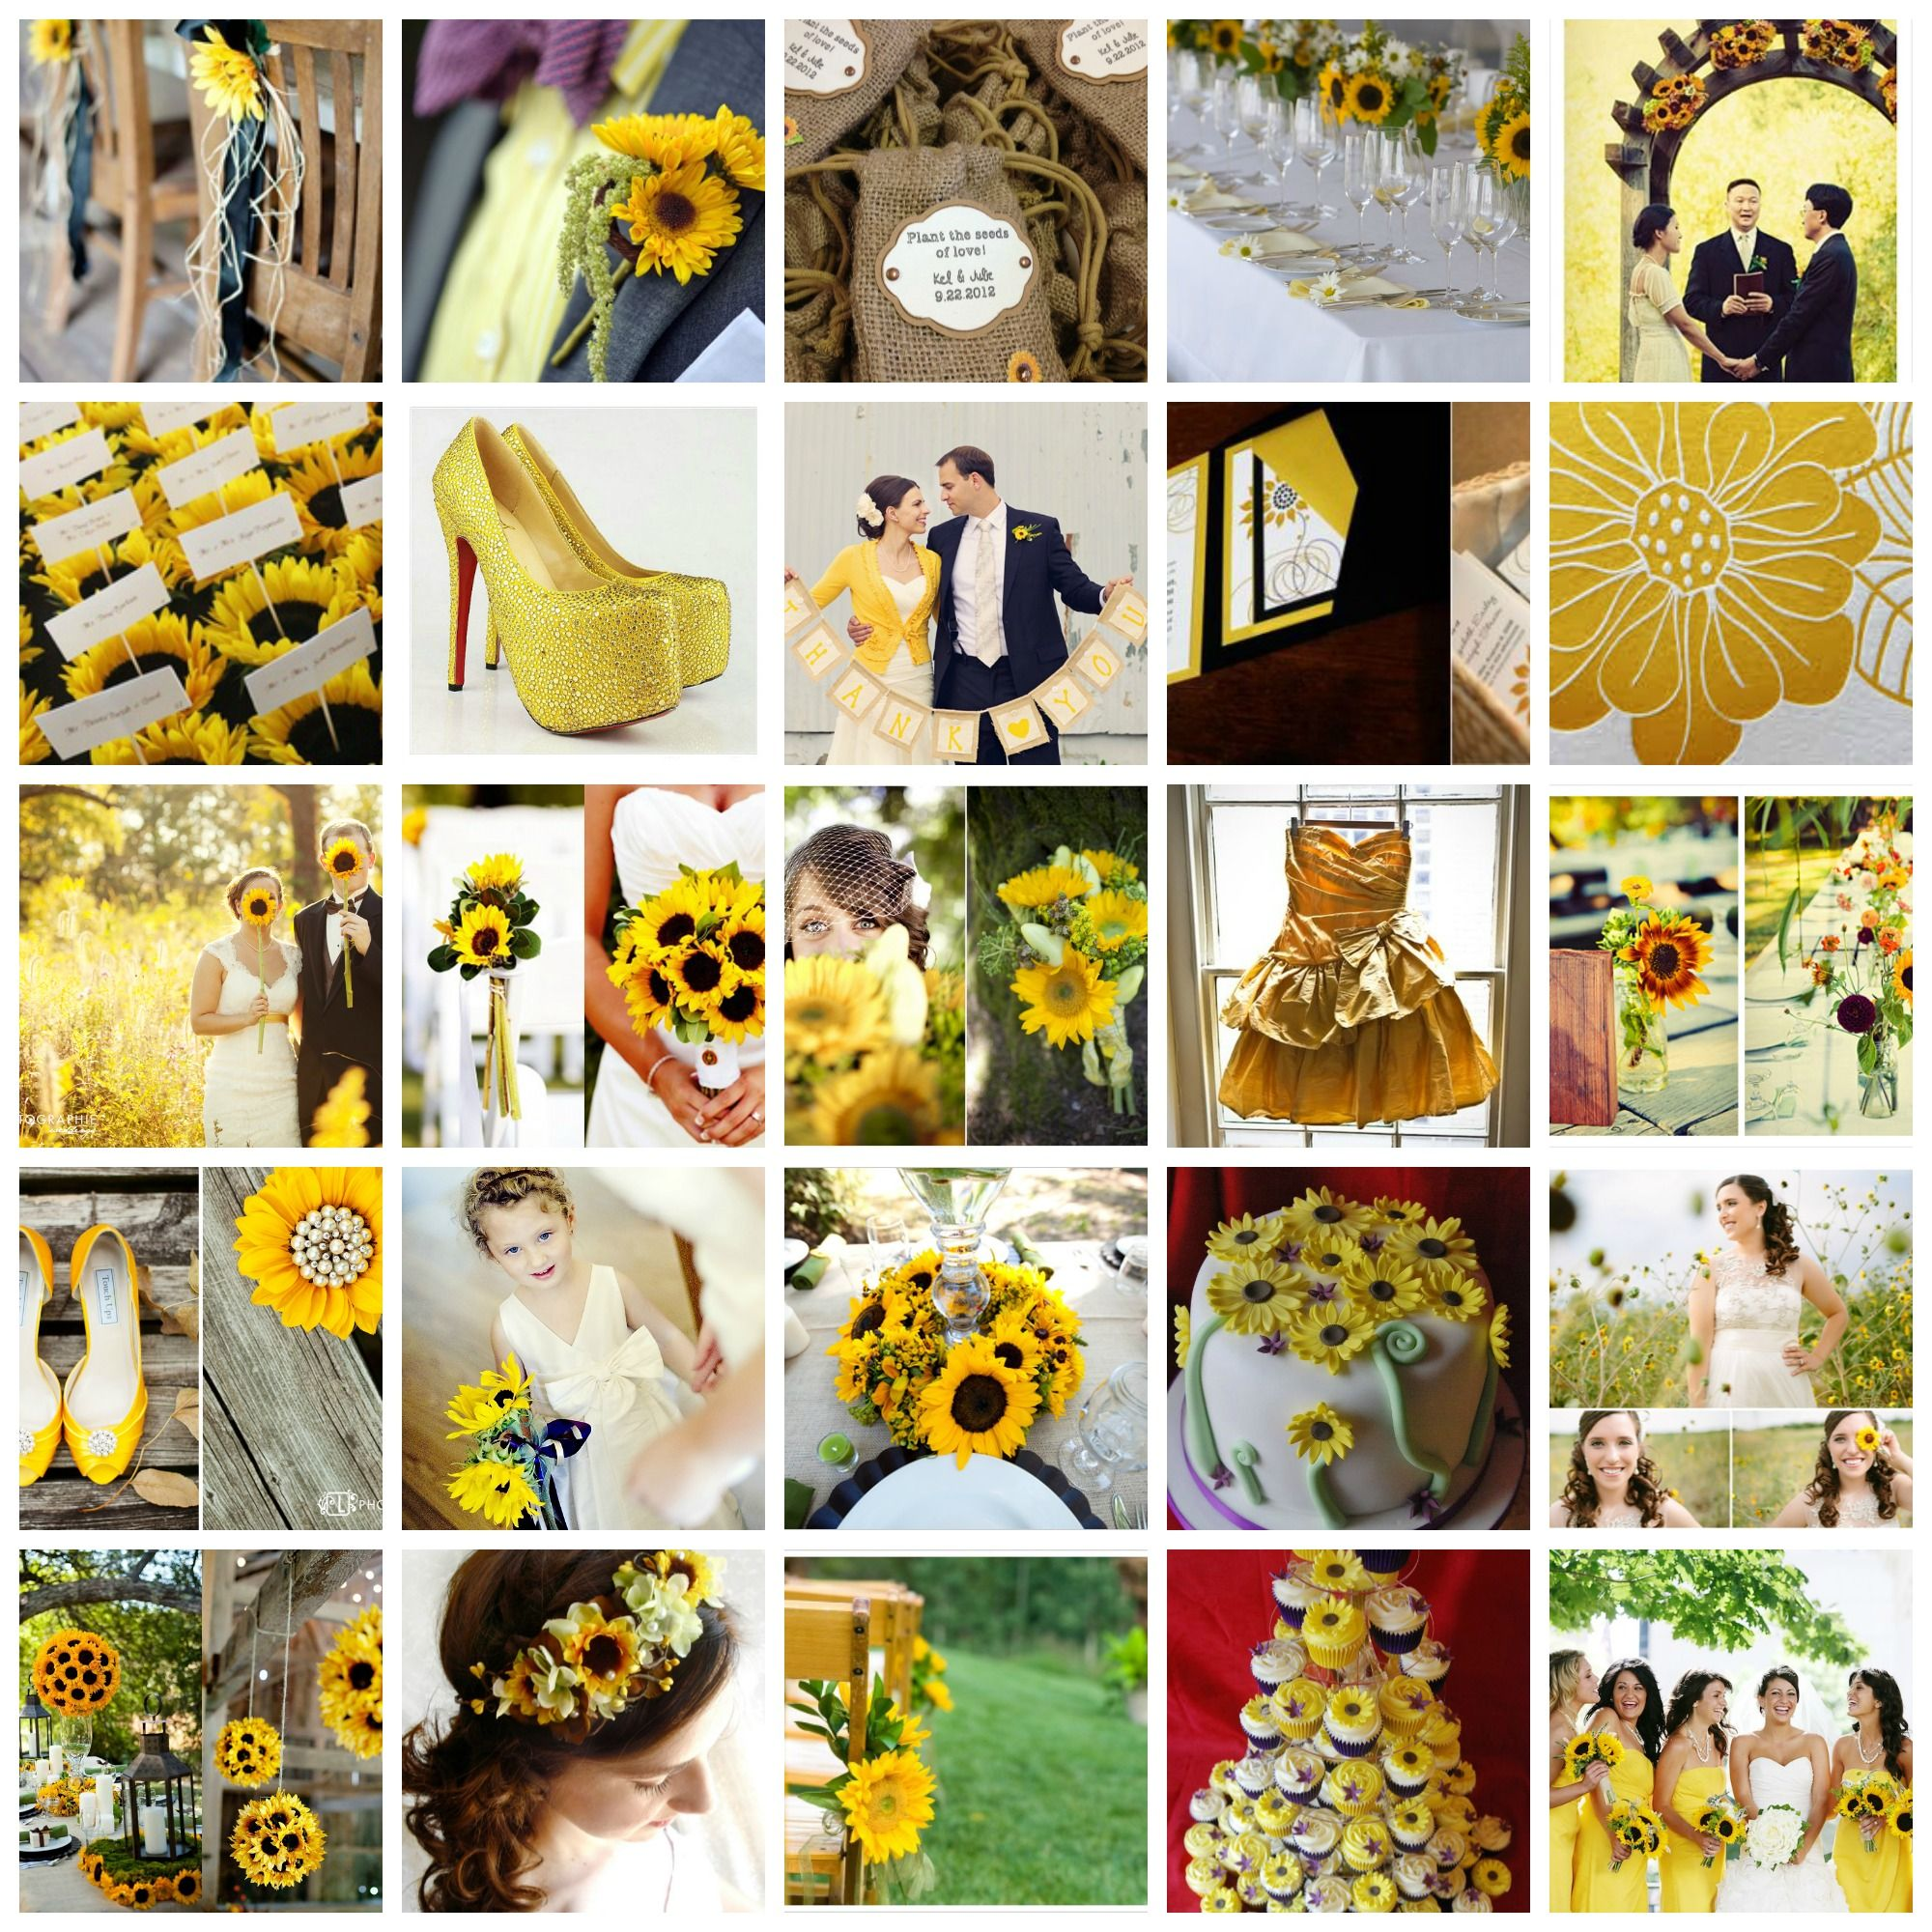 Sunflower Wedding Cake Ideas | Walking on Sunshine - Sunflower ...